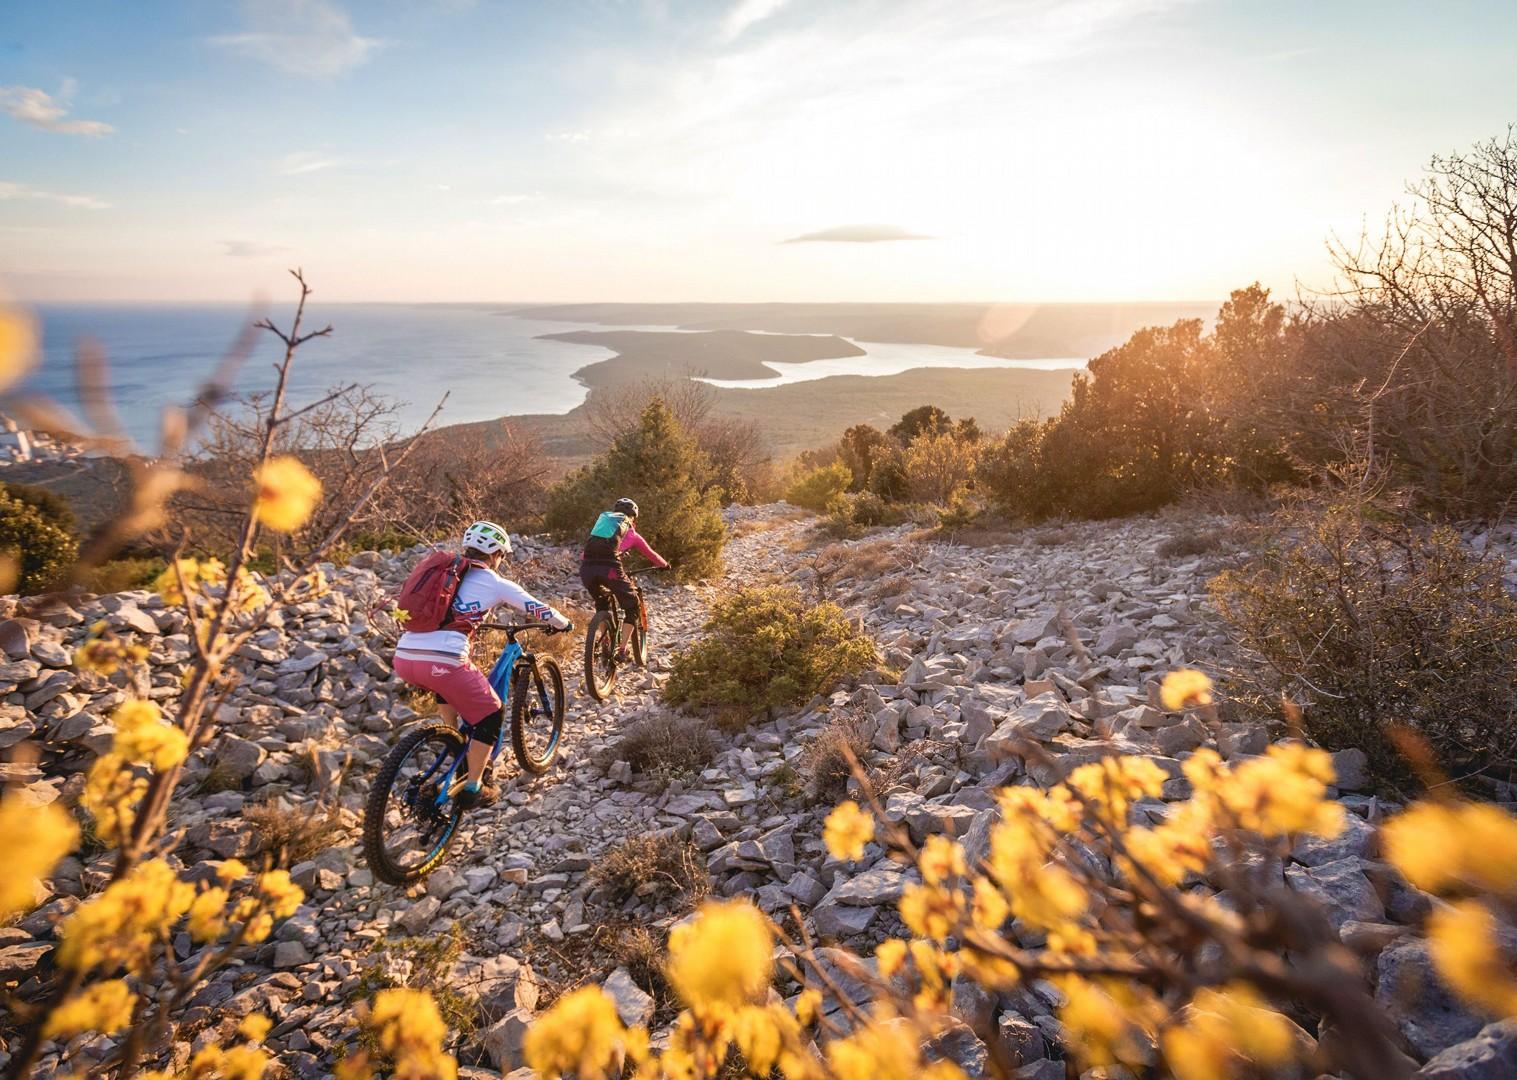 croatia-terra-magica-guided-mountain-biking-holiday.jpg - Croatia - Terra Magica - Guided Mountain Biking Holiday - Mountain Biking